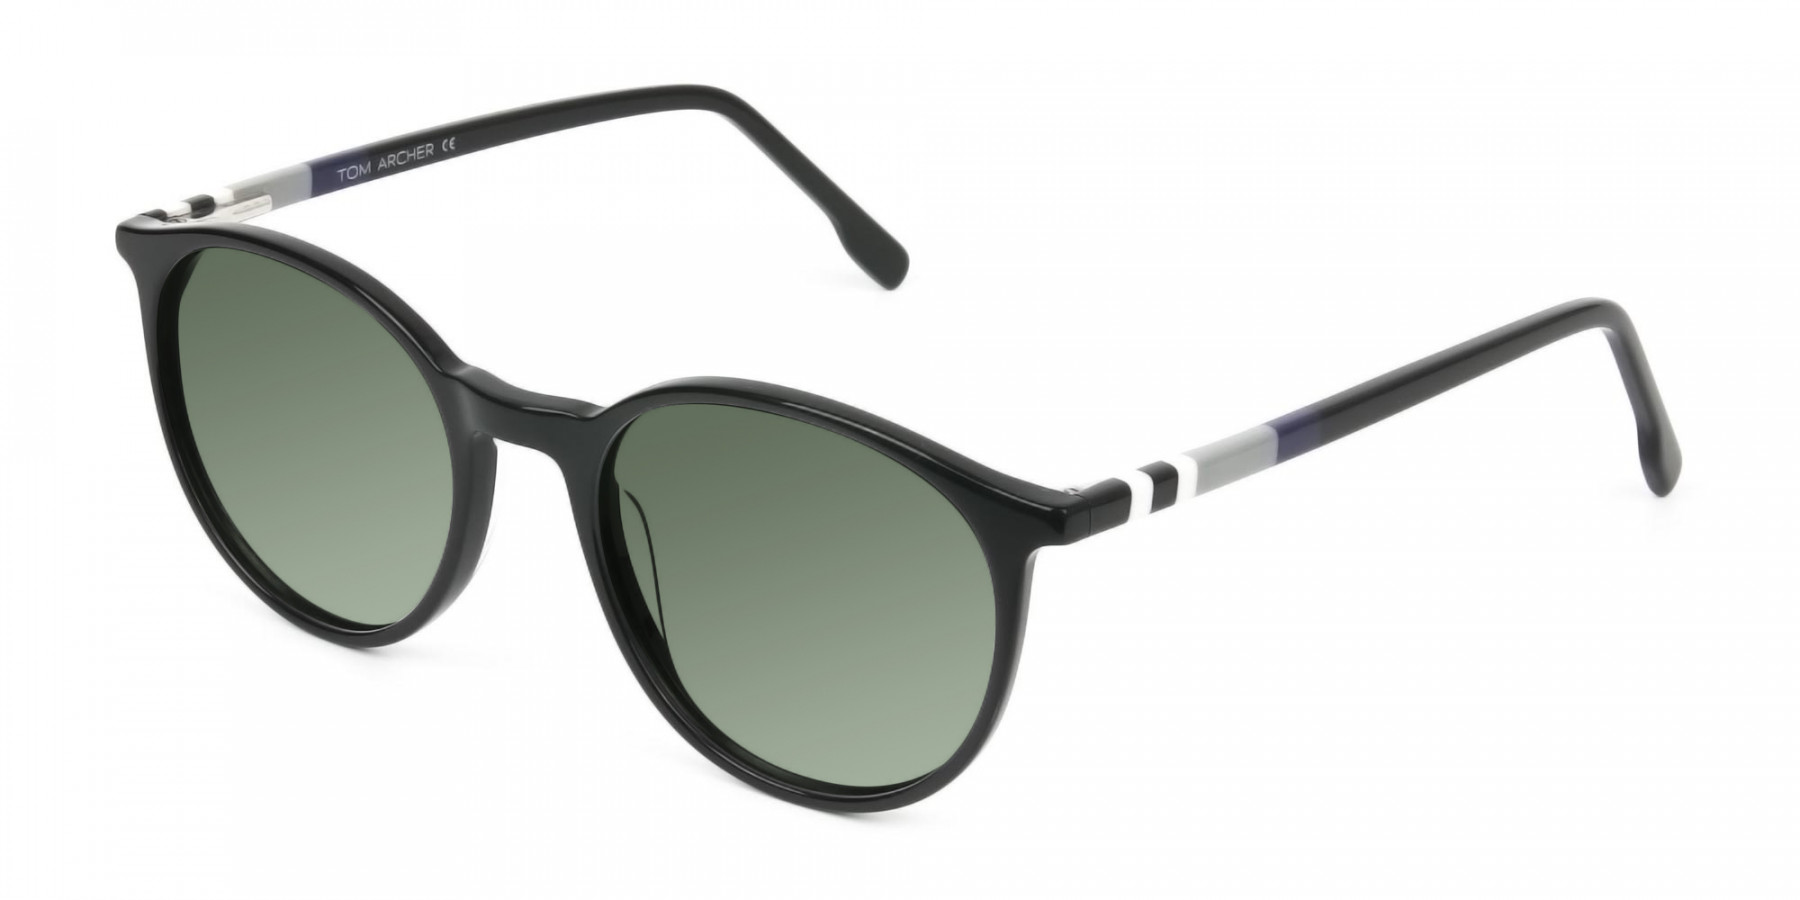 Dark-green-black-round-sunglasses - 3